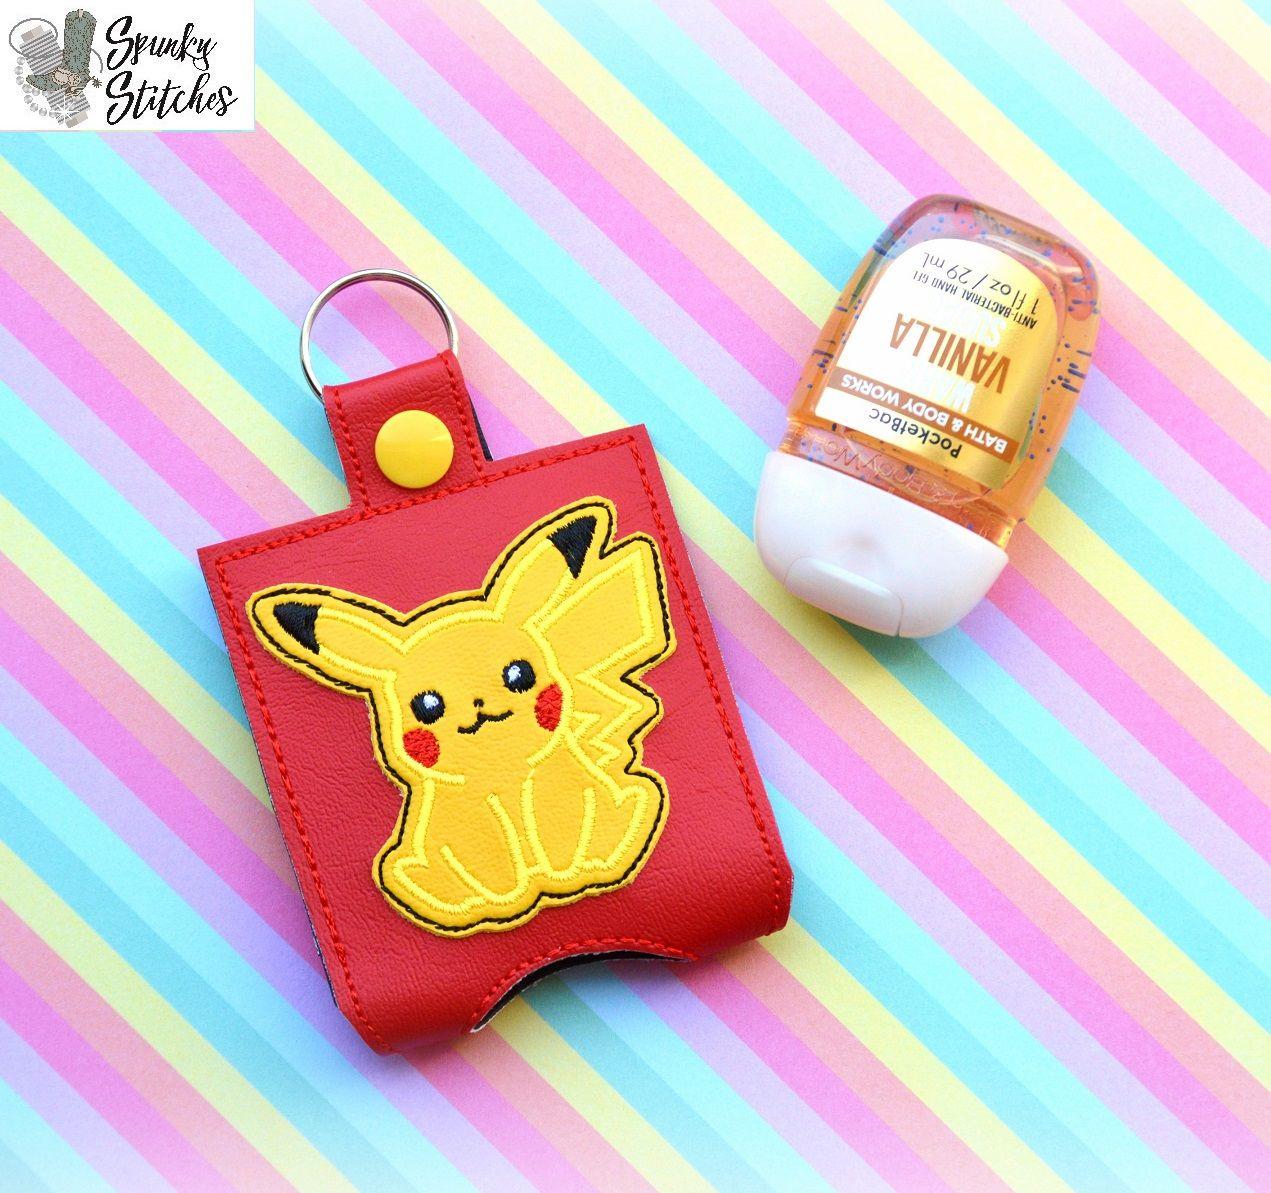 Pikachu Sanitizer Holder Key Fob Hand Sanitizer Holder